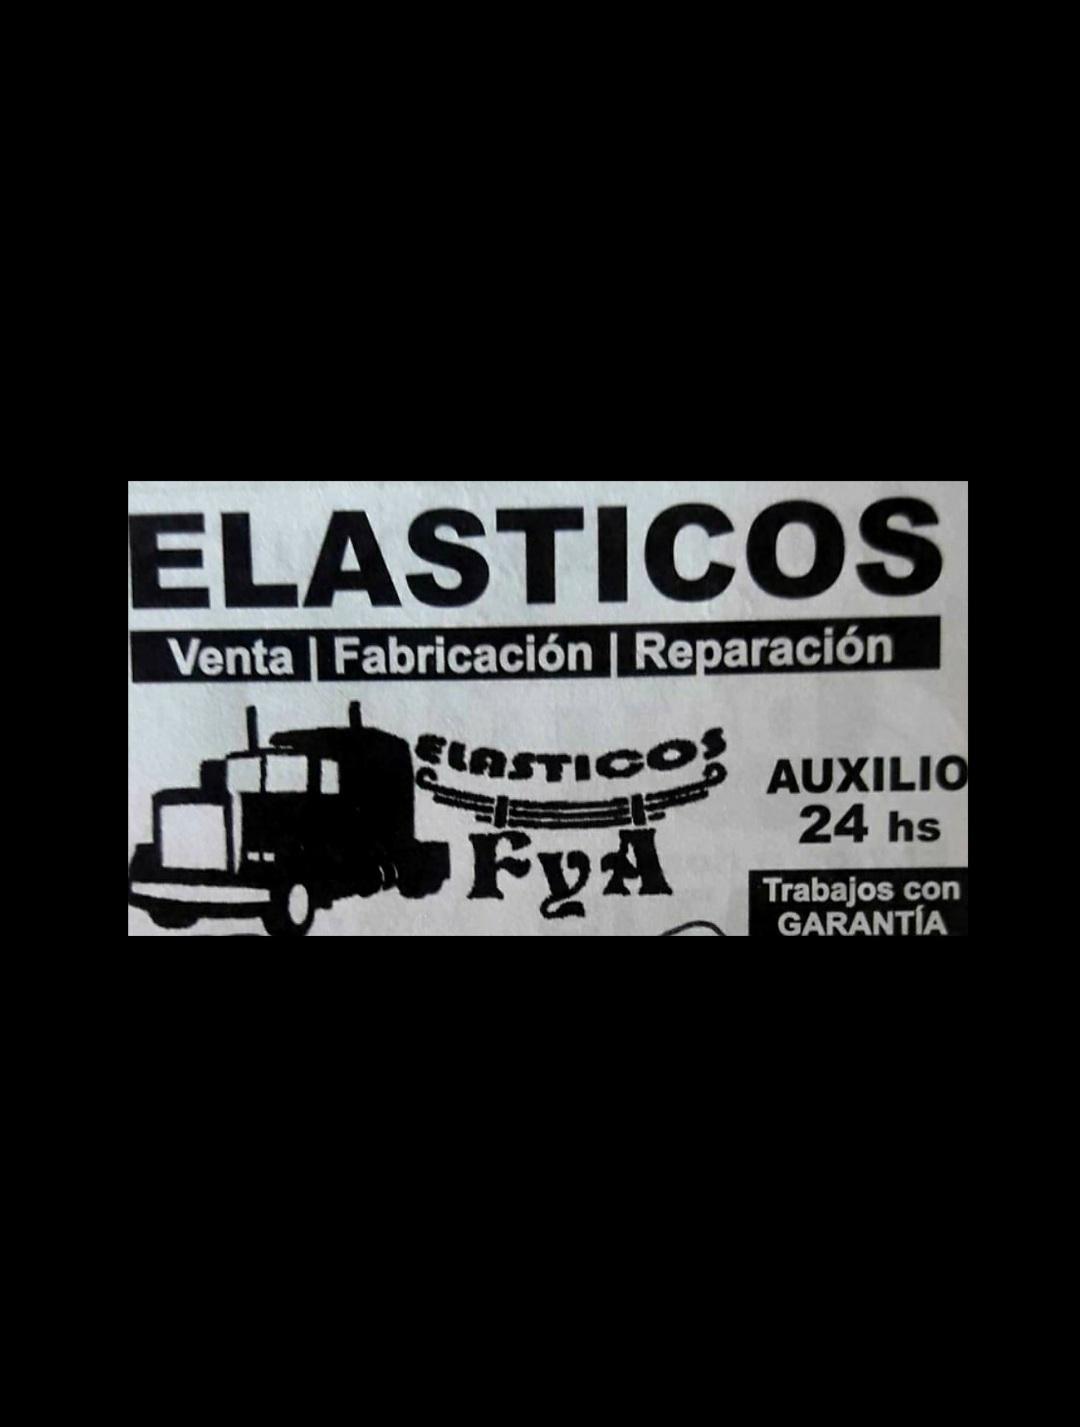 Elasticos FyA